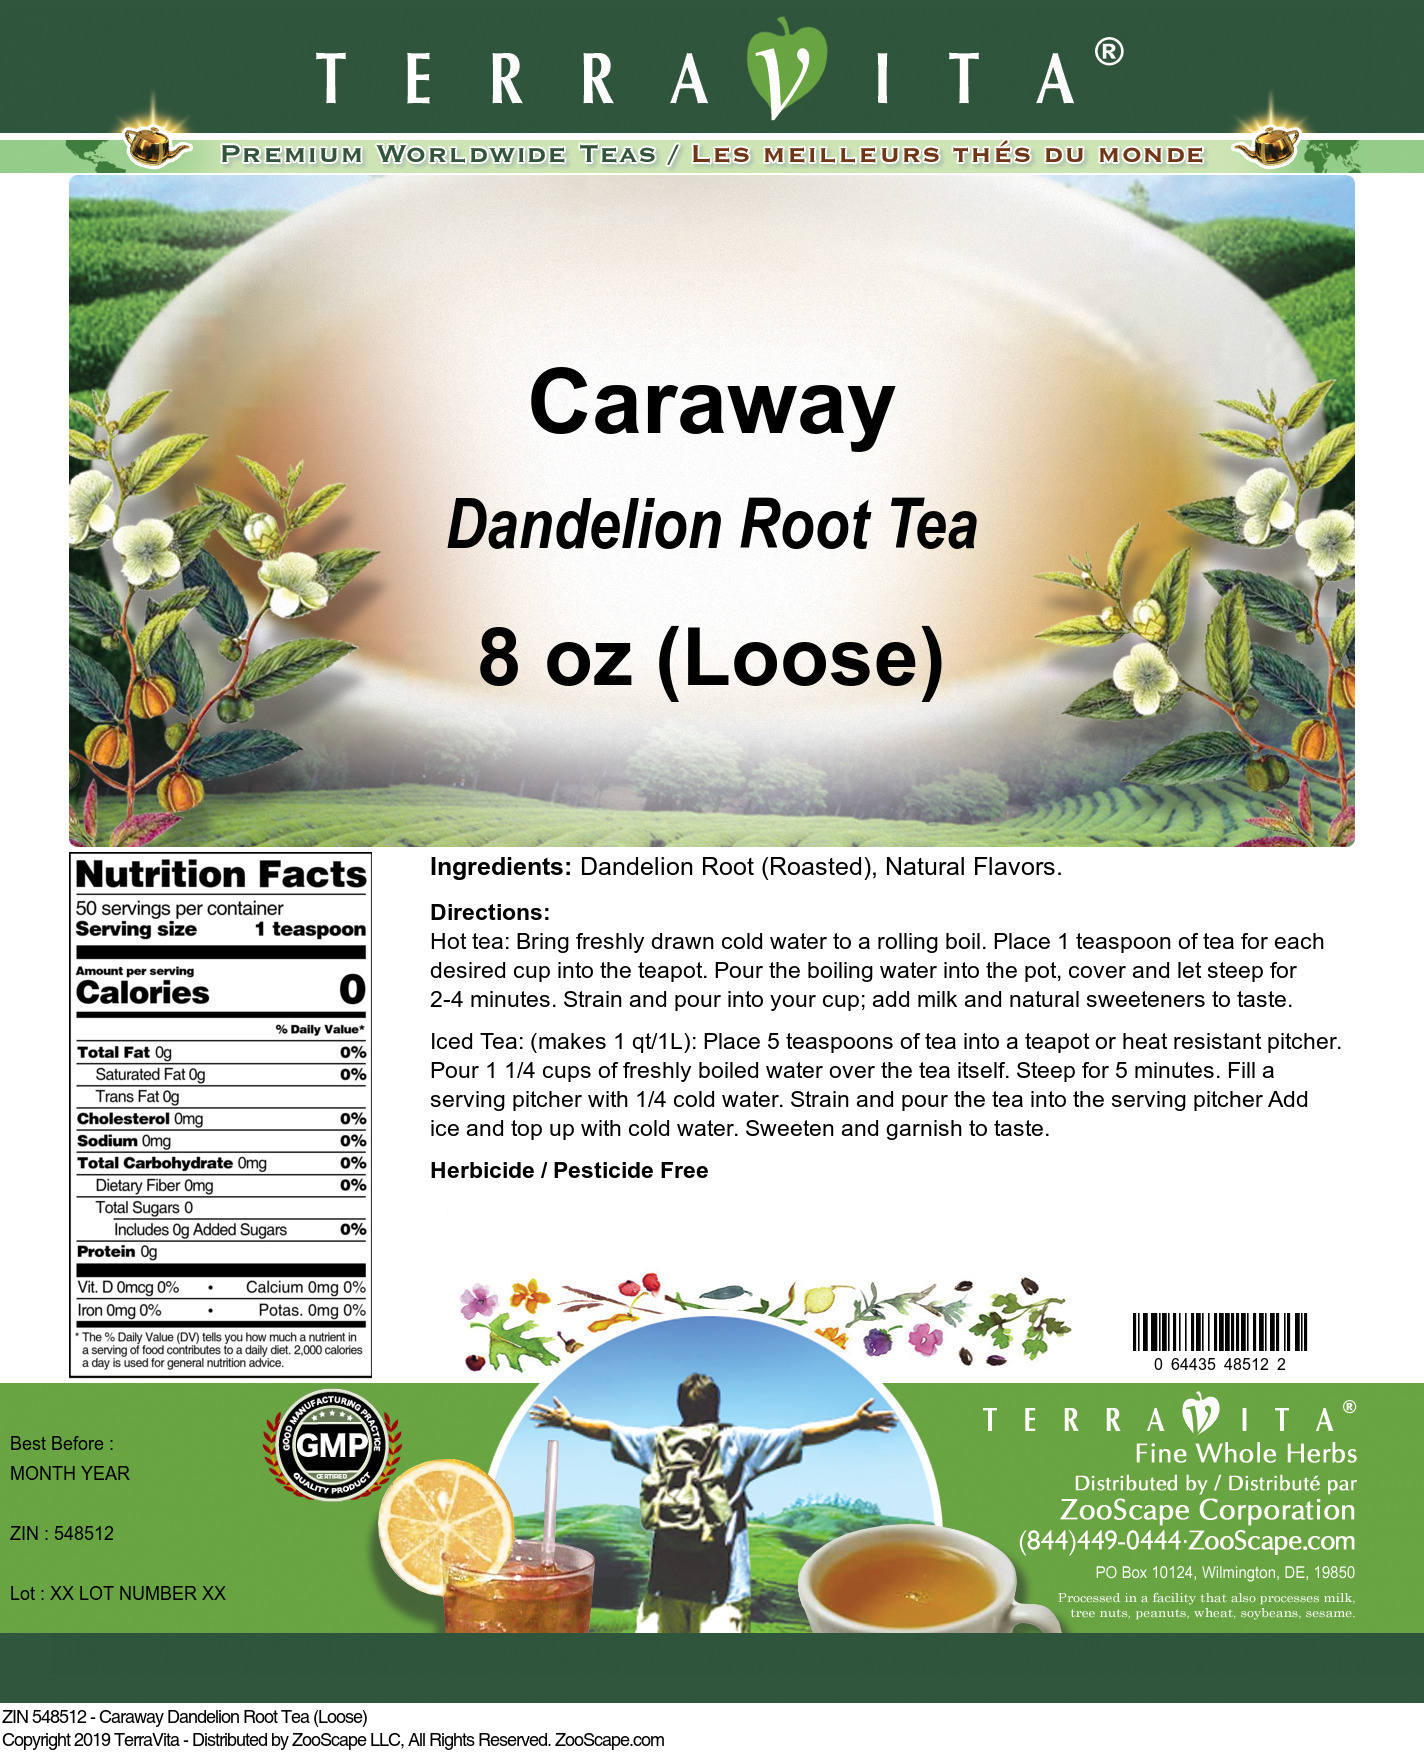 Caraway Dandelion Root Tea (Loose)